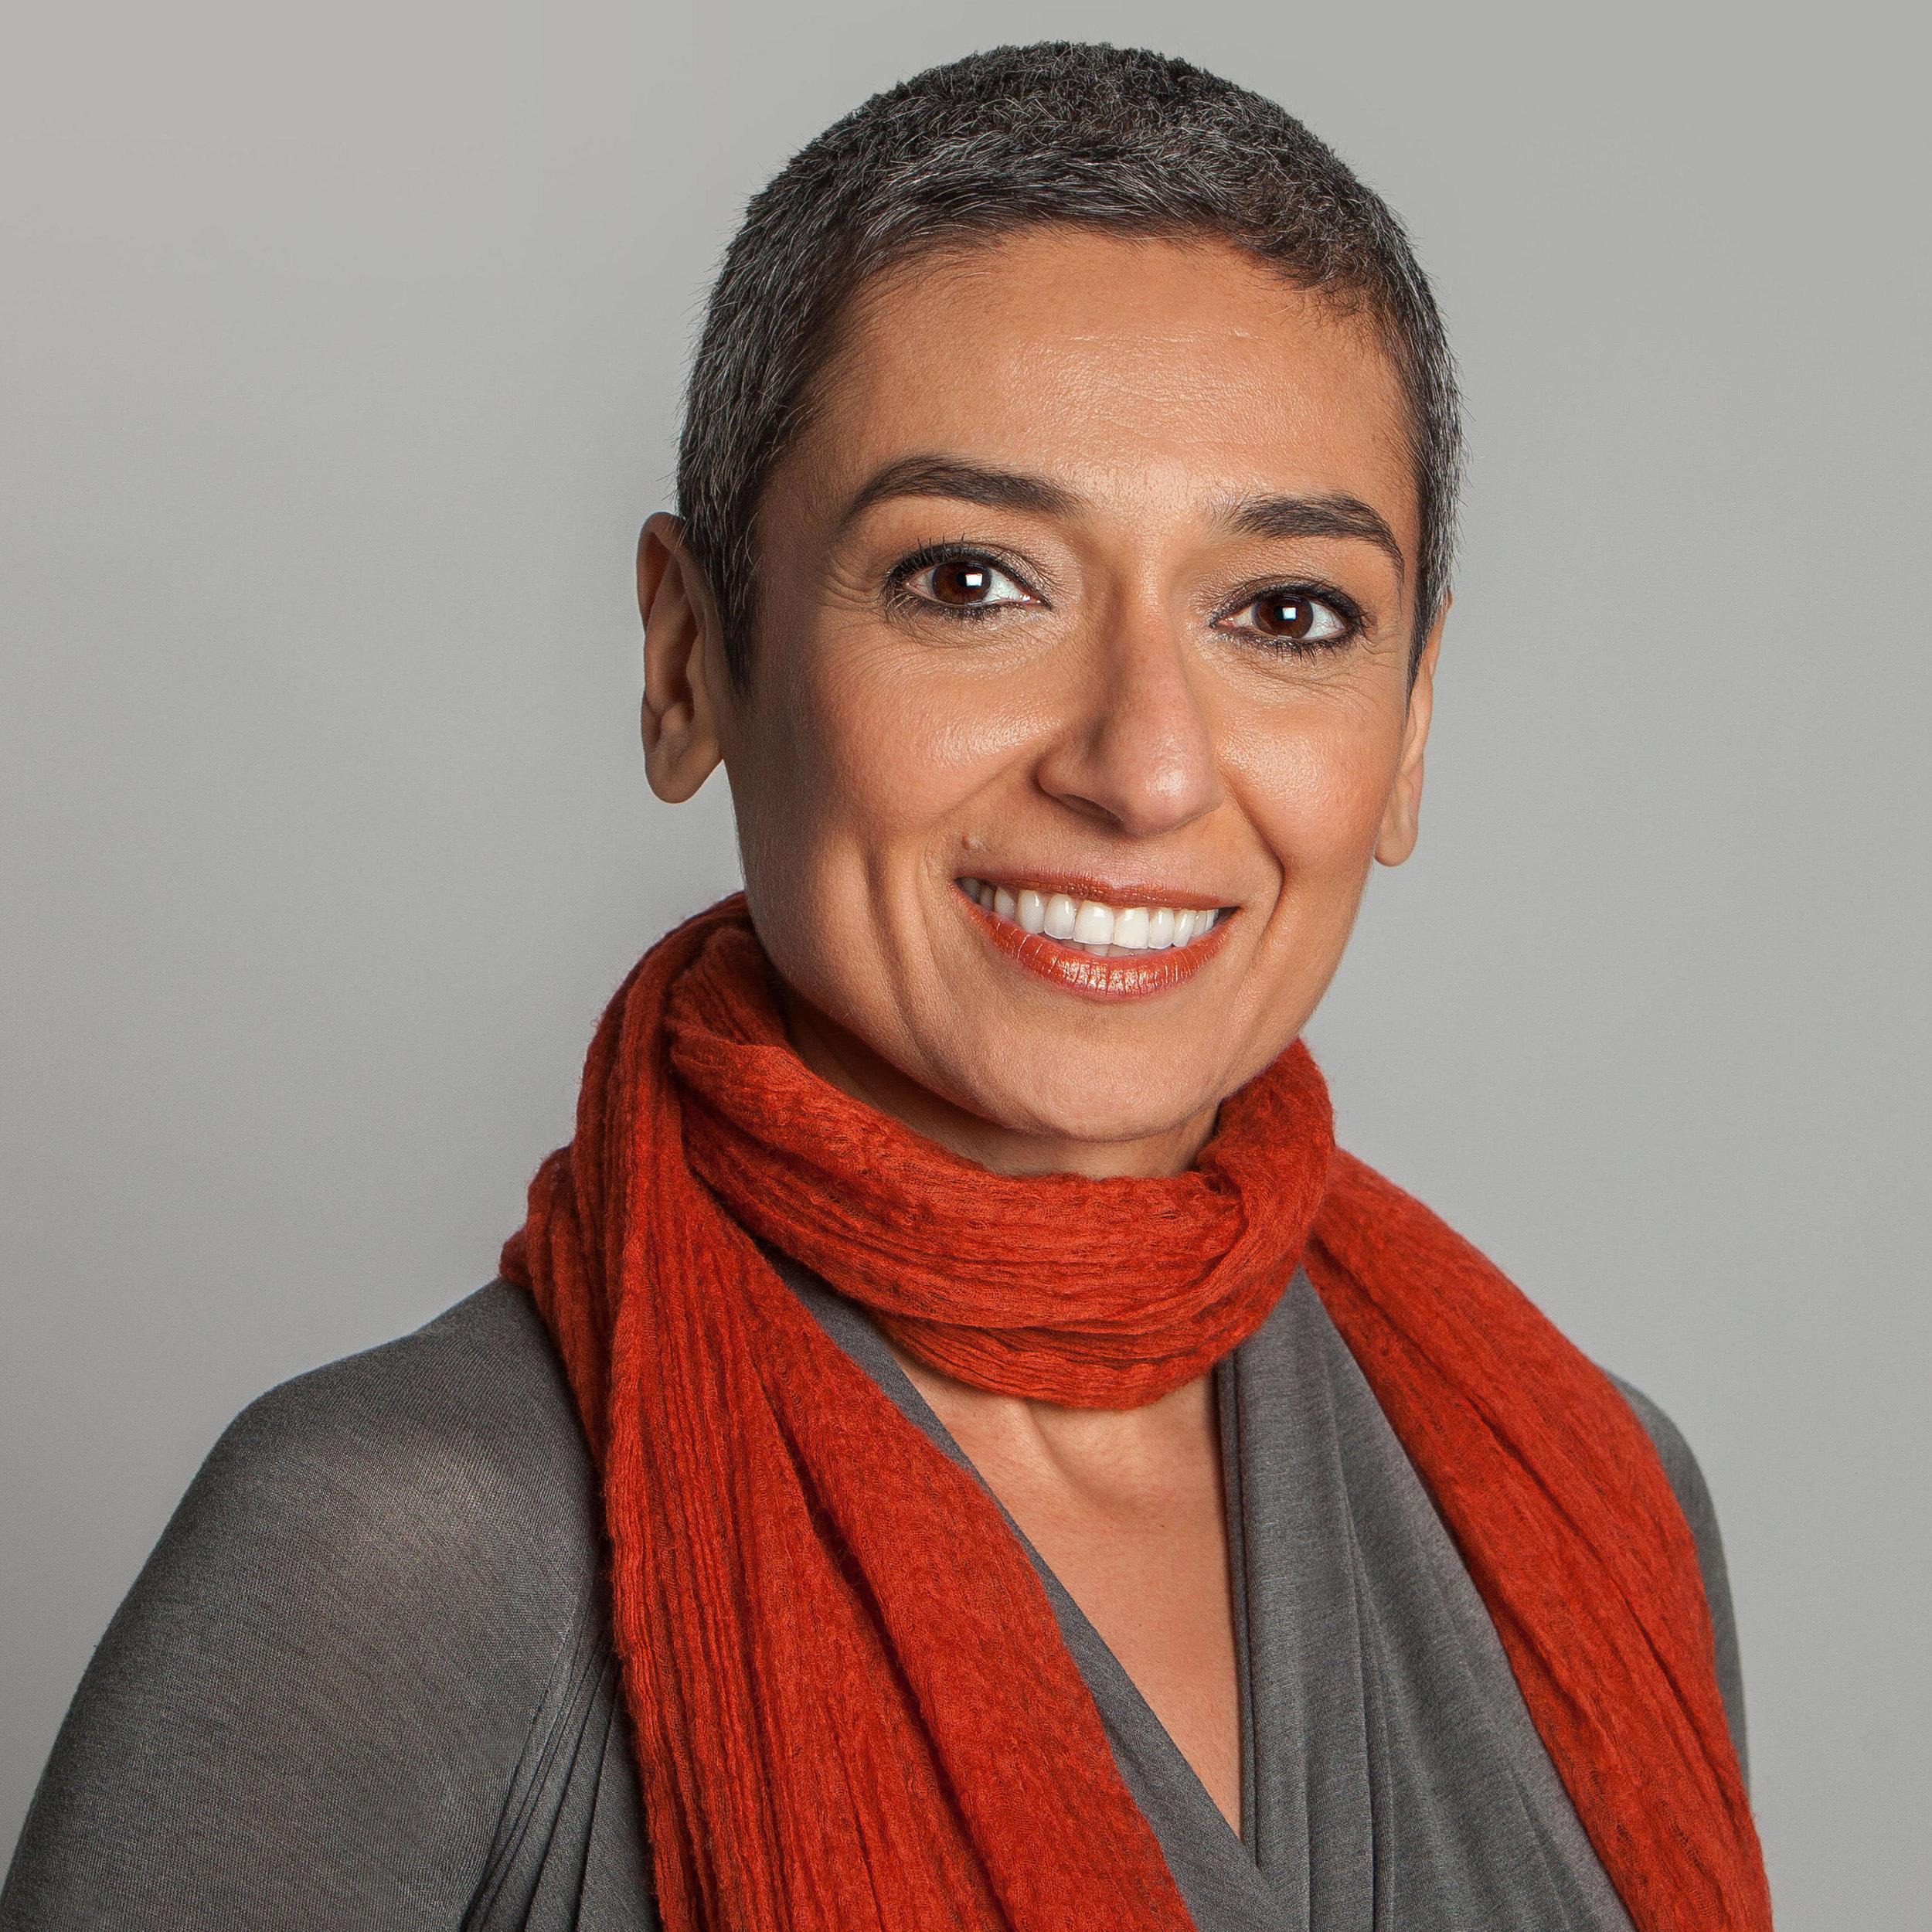 Zainab Salbi - Humanitarian, Media Host & Author